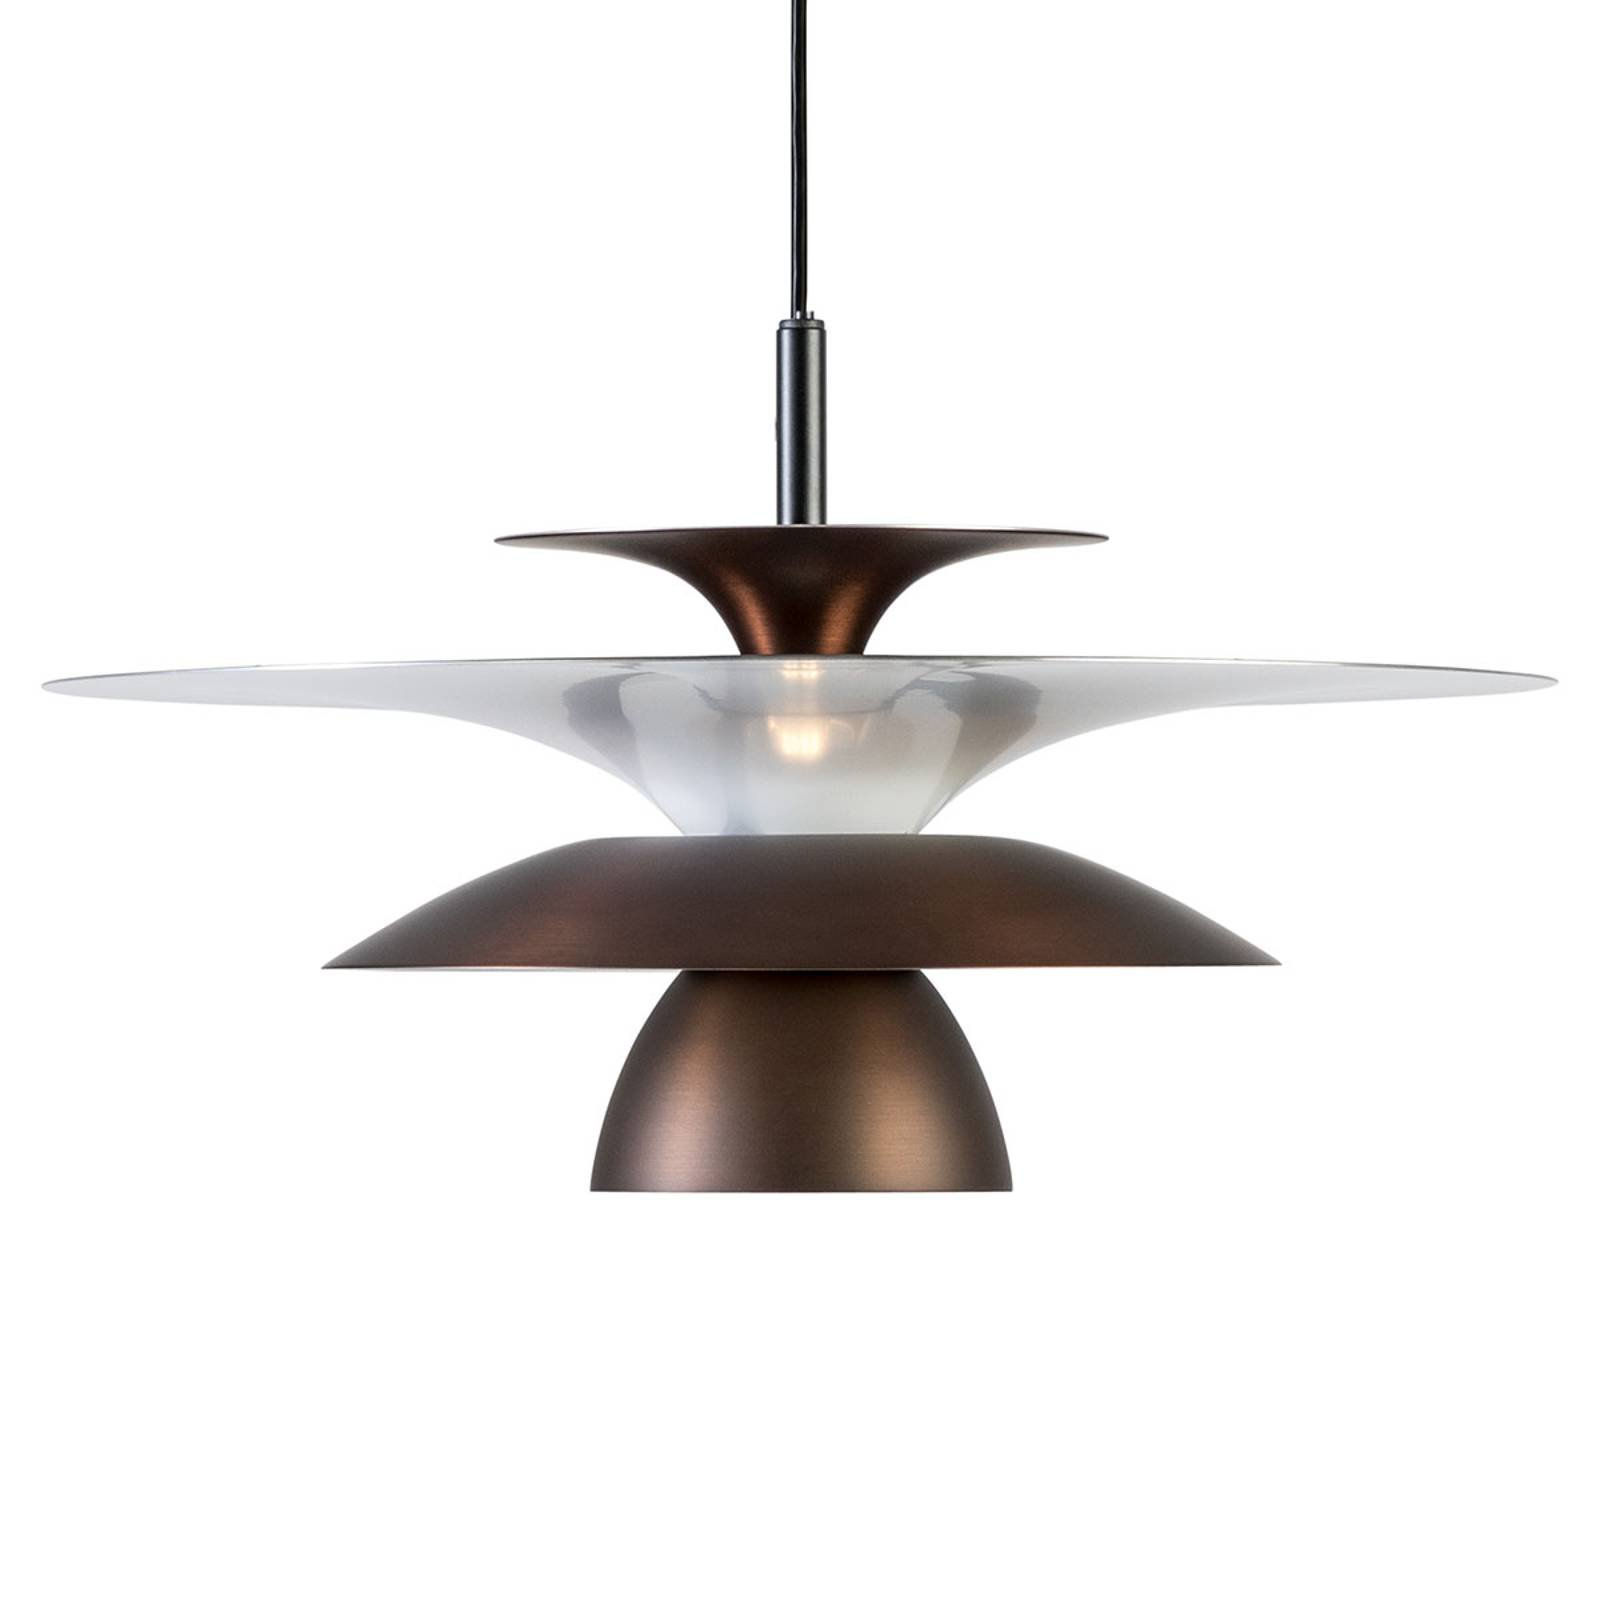 LED-pendellampe Picasso 1 lyskilde Ø 38cm rustbrun